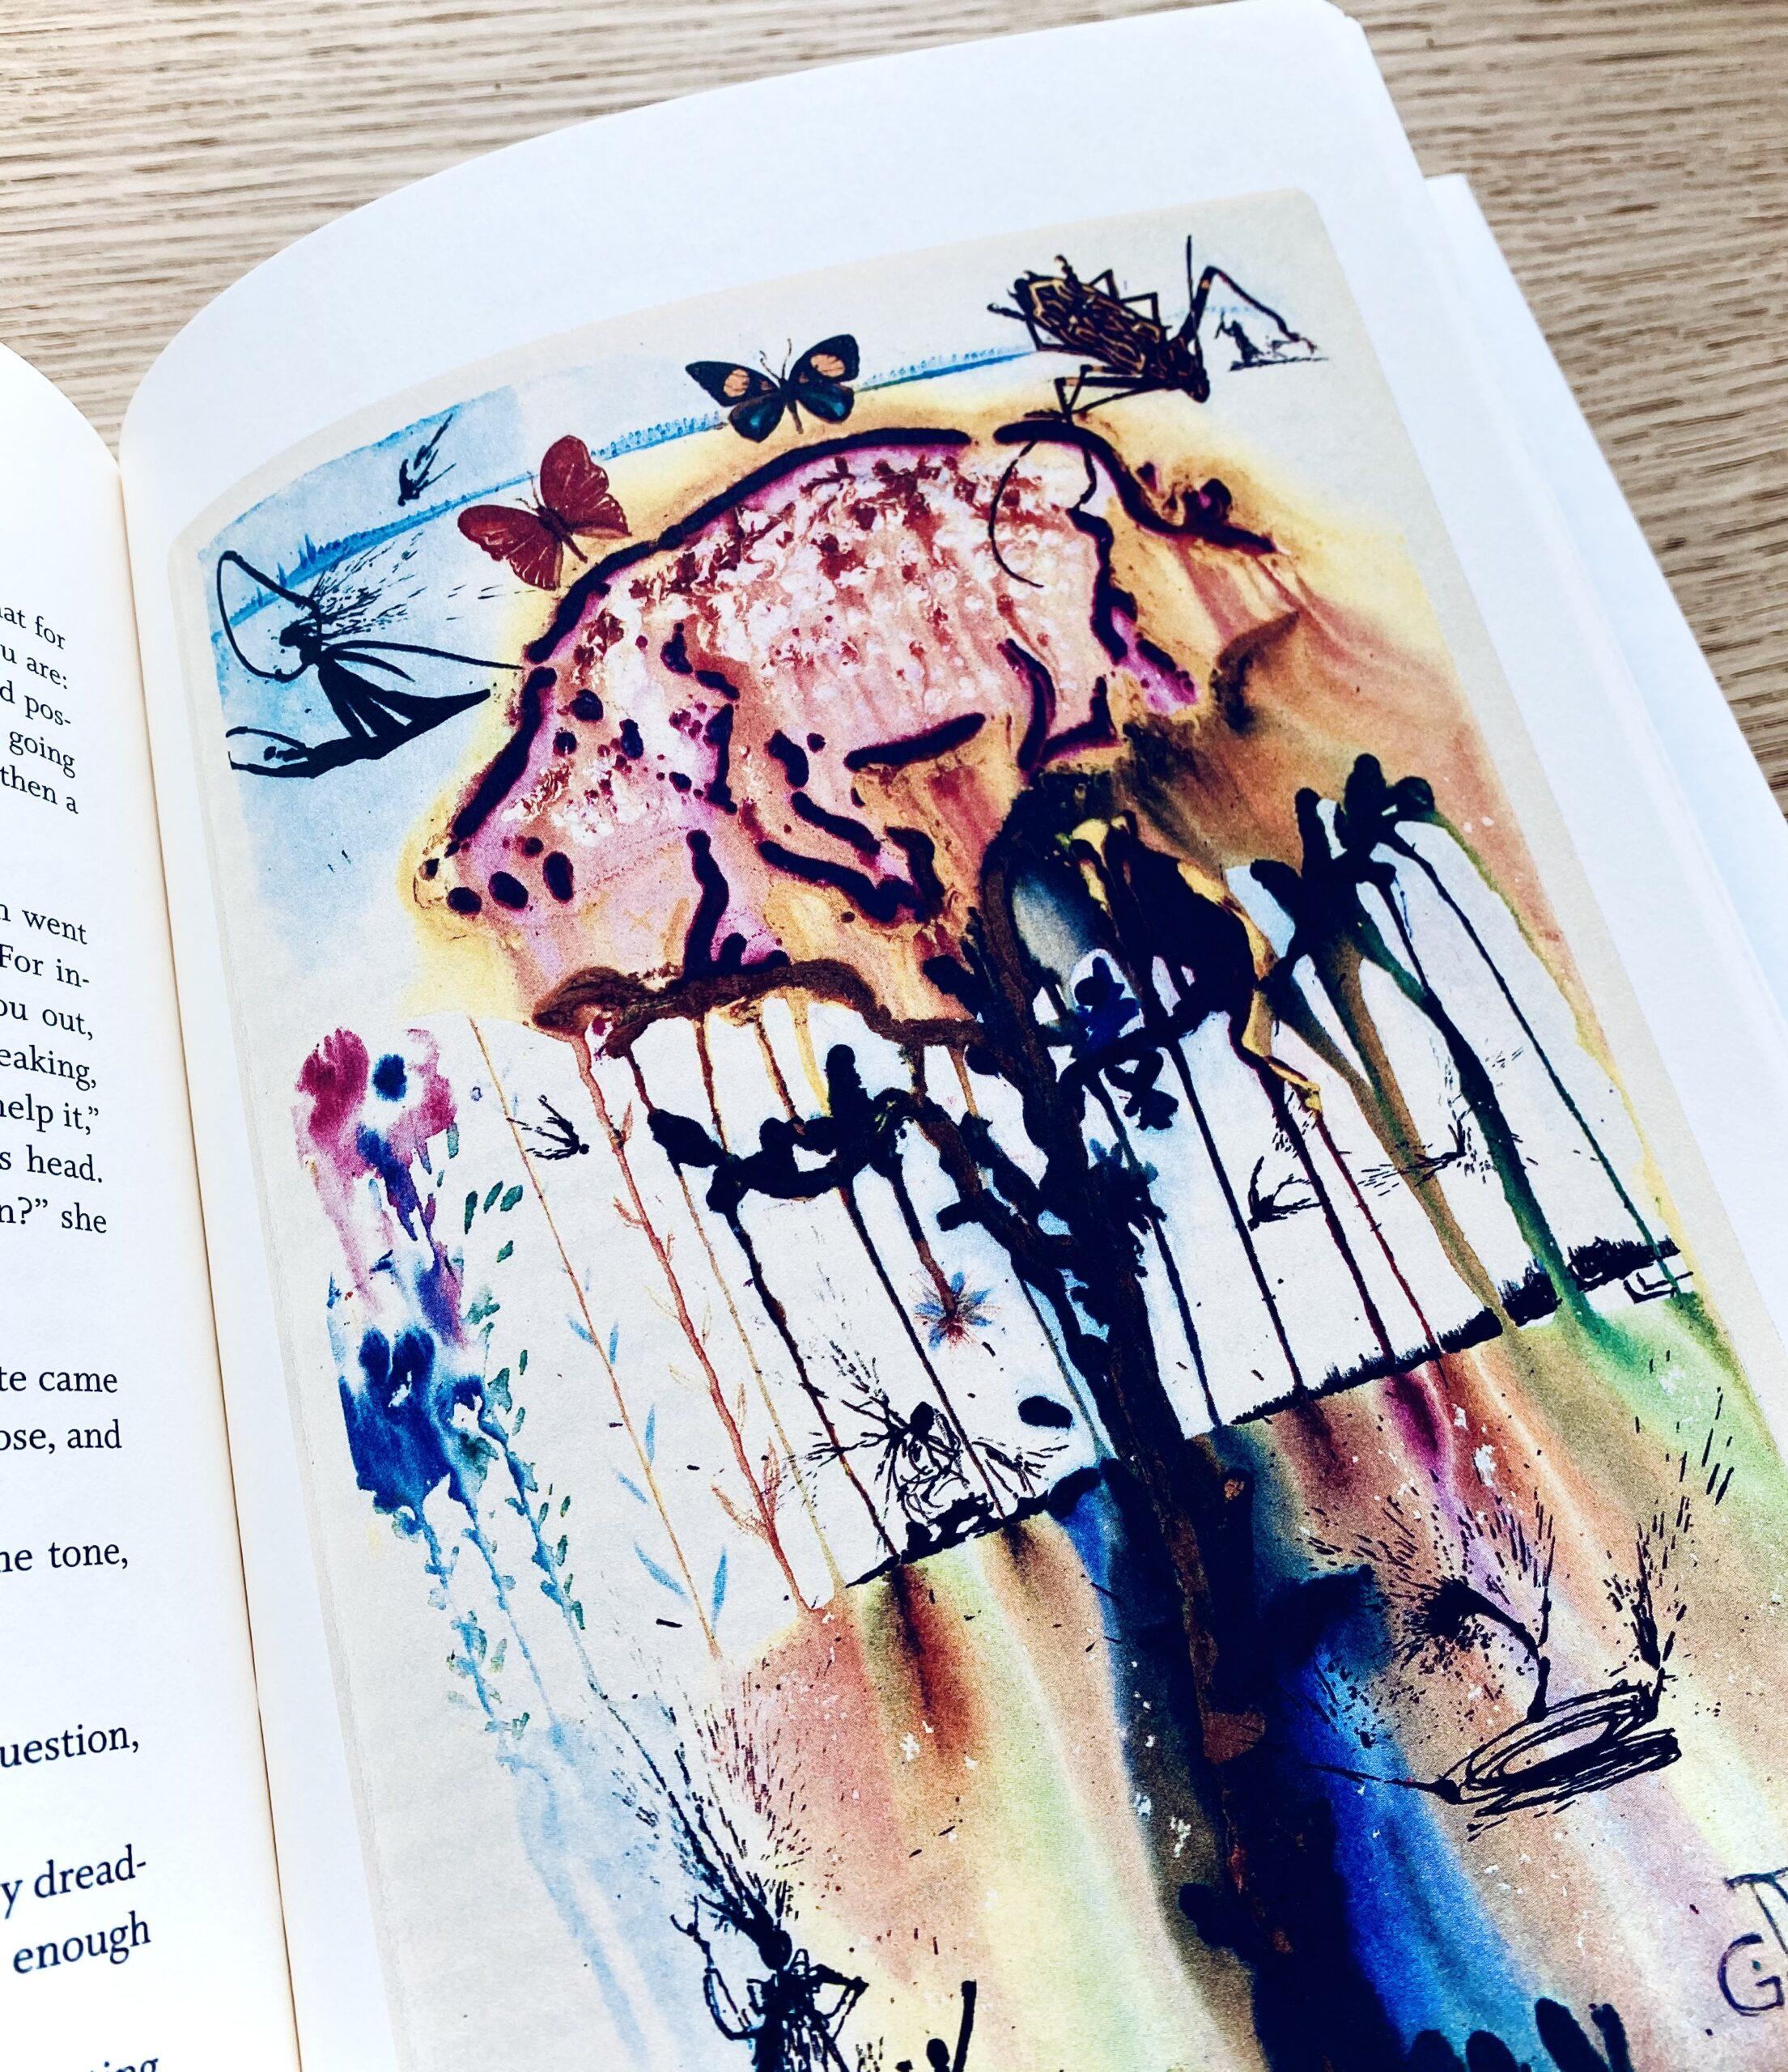 alice in wonderland, books, writing, art, salvador dali, illustrate